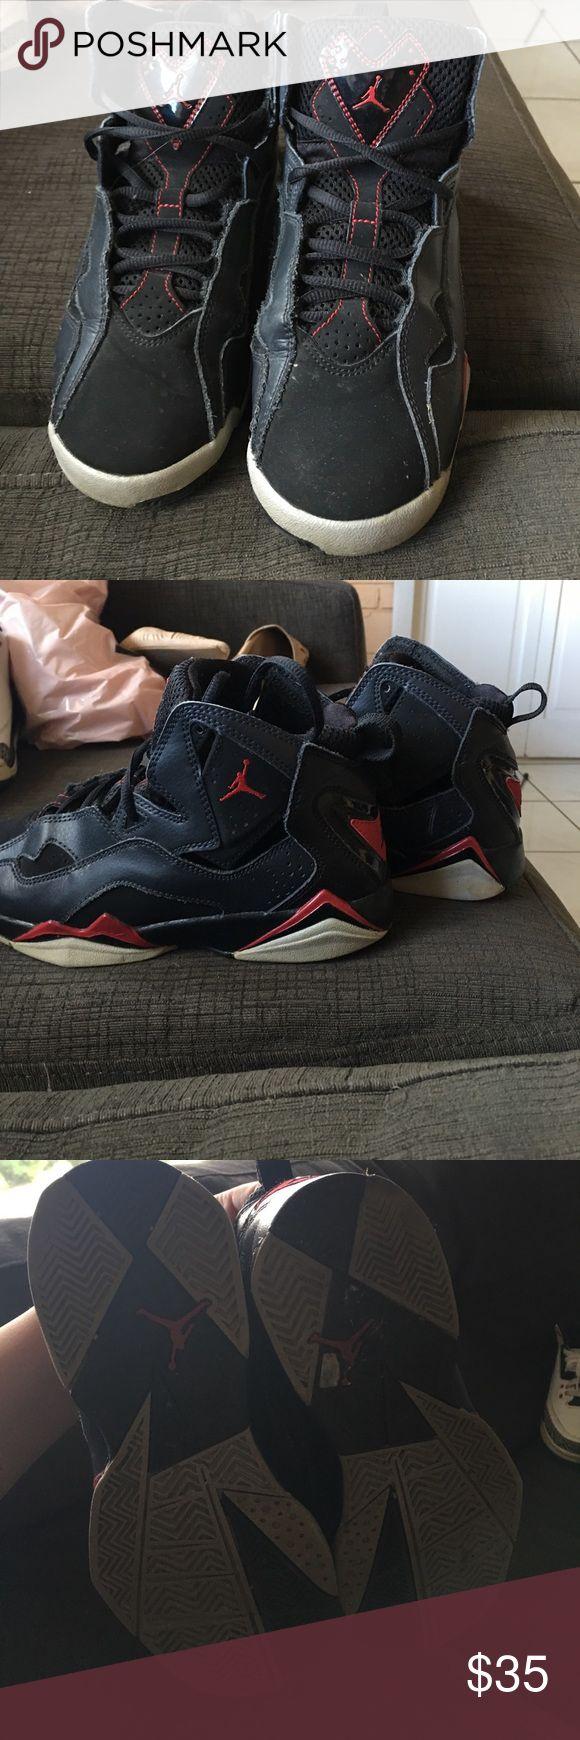 Jordan True Flight in used condition- price negotiable Jordan Shoes Sneakers